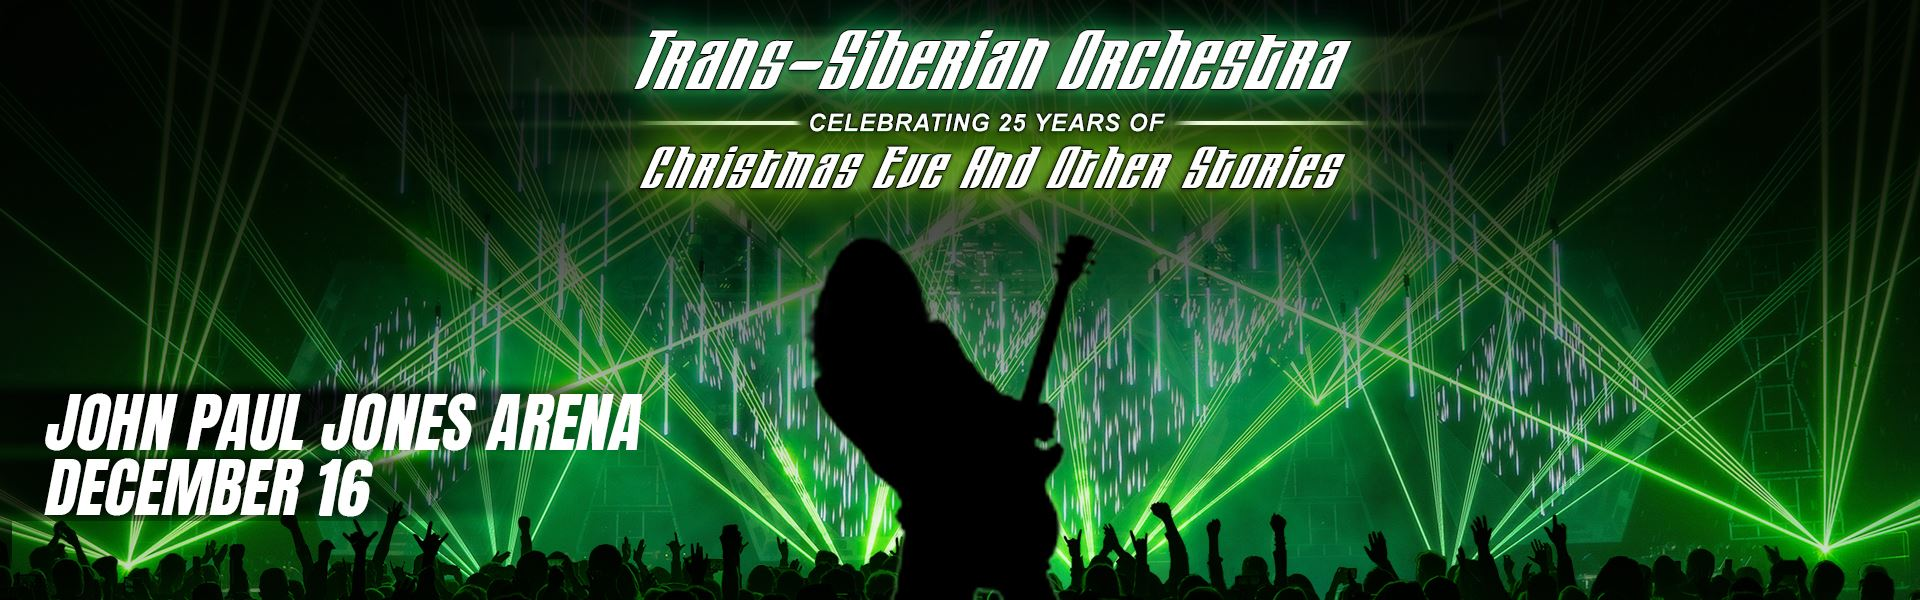 Trans-Siberian Orchestra – Christmas Eve & Other Stories:  Thu • Dec 16 • 7:30 PM:  John Paul Jones Arena